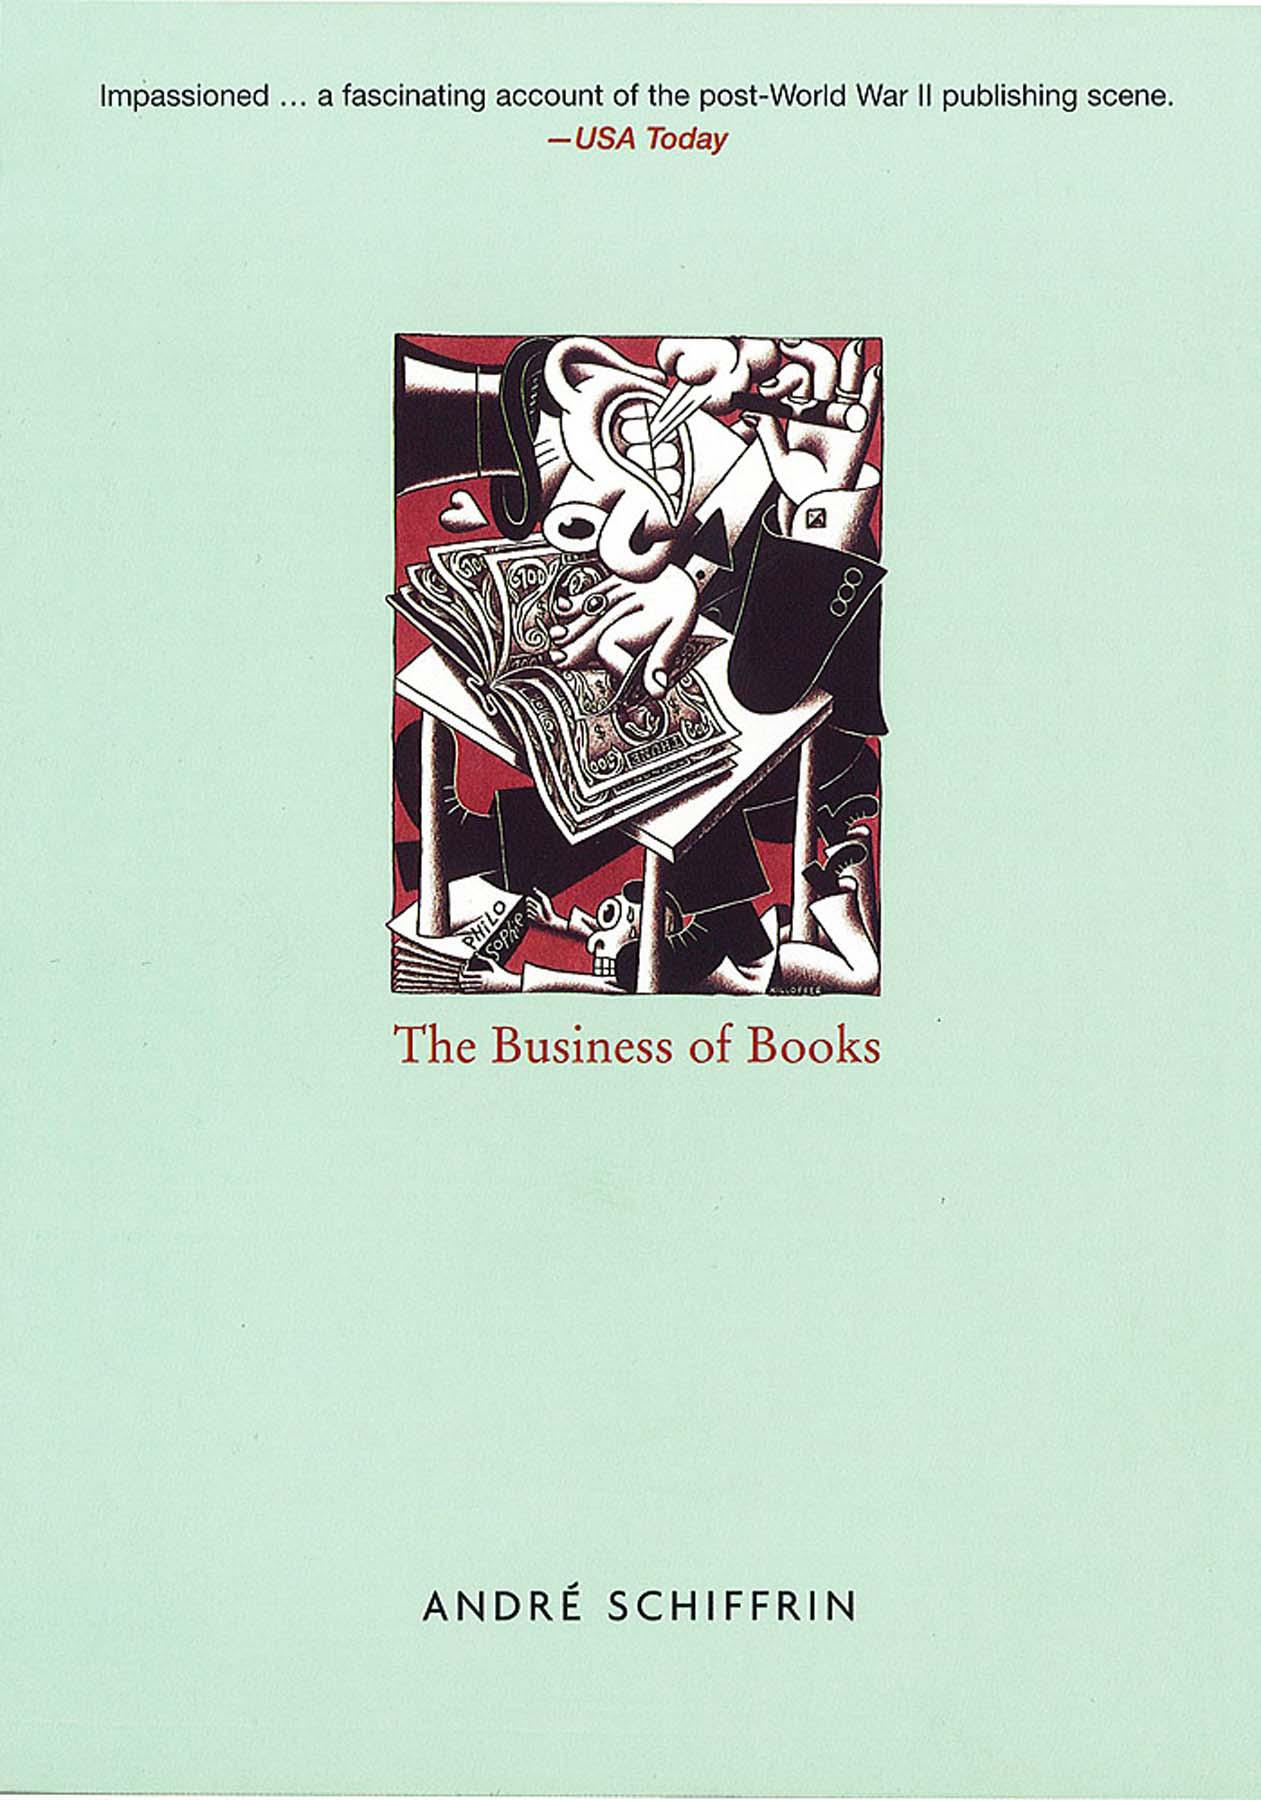 Business_of_books_PB-6b4f6fcb6cf86615a733893dfa59e024